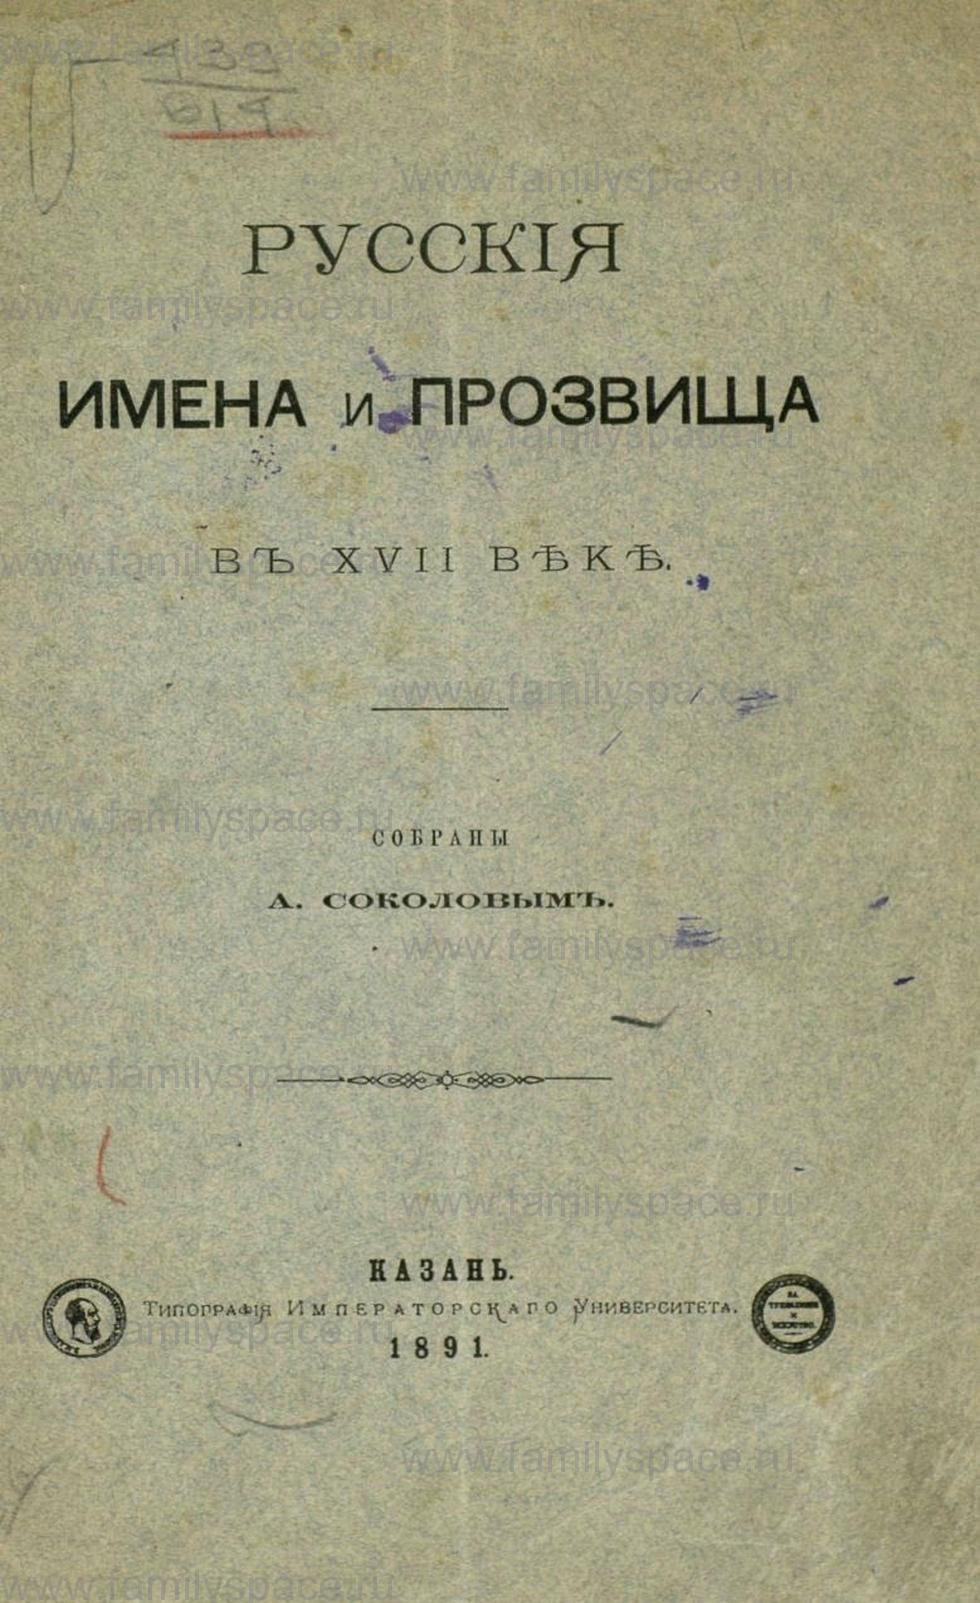 Поиск по фамилии - Русские имена и прозвища в 17 веке, страница 1